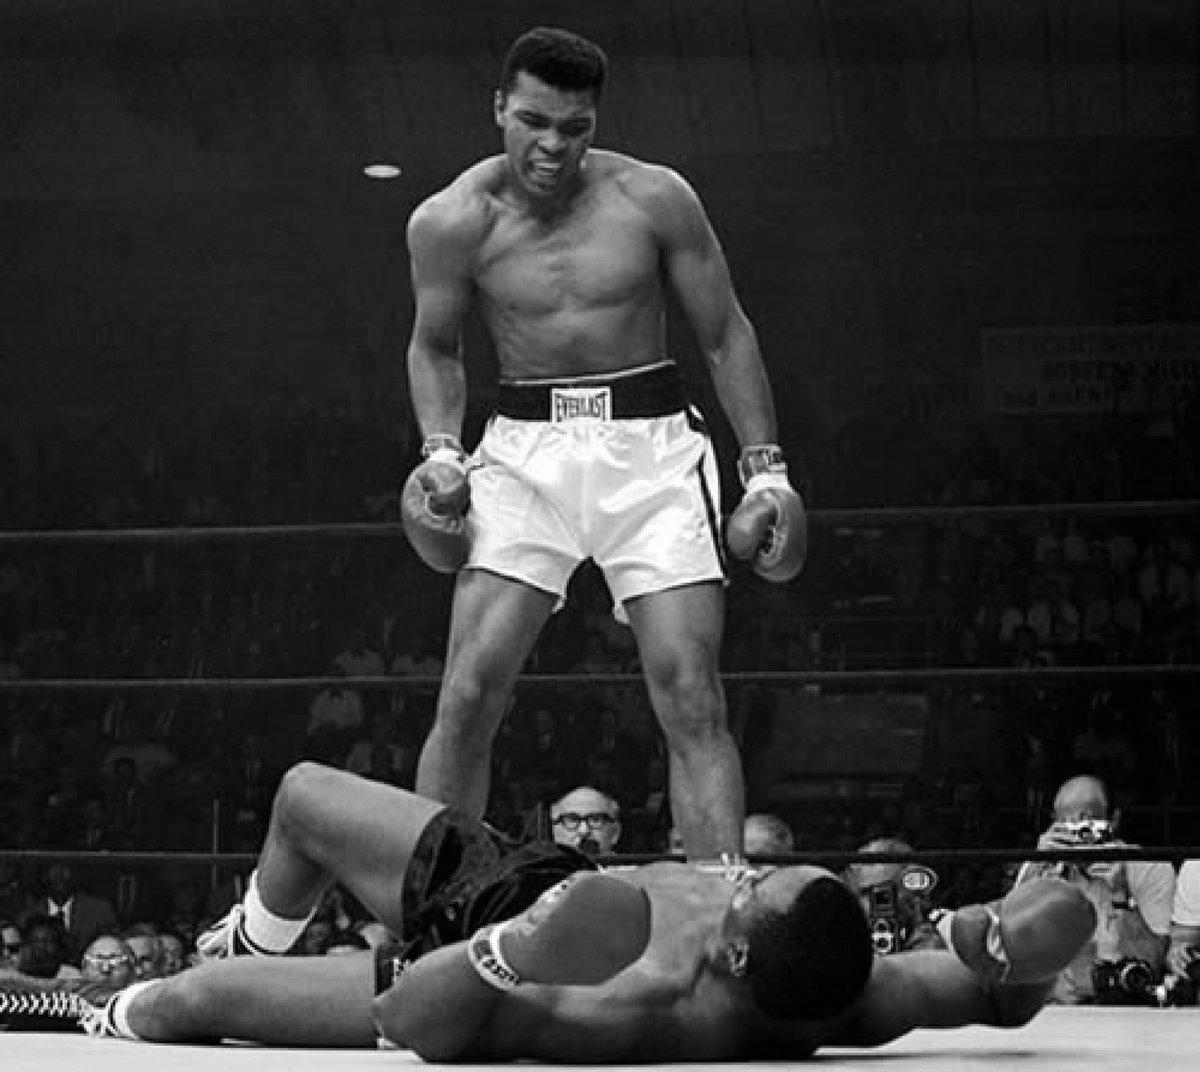 RIP Muhammad Ali boxing has lost a legend https://t.co/jR1WB8W4tH